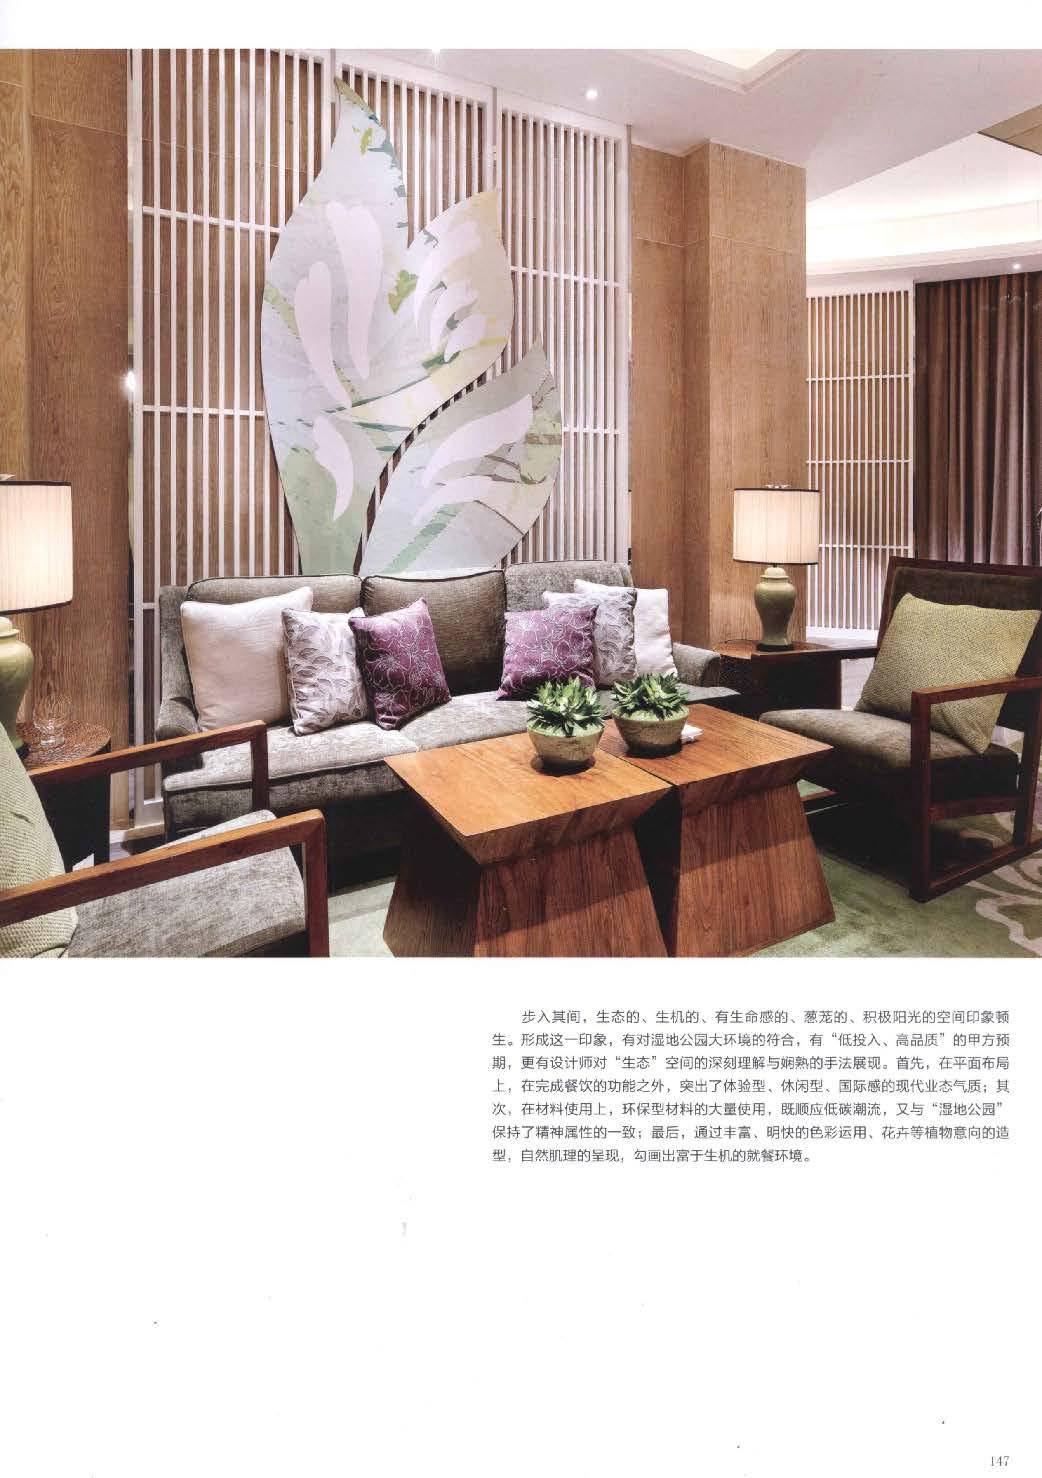 H073 东方风情 会所、餐饮细部解析_Page_145.jpg